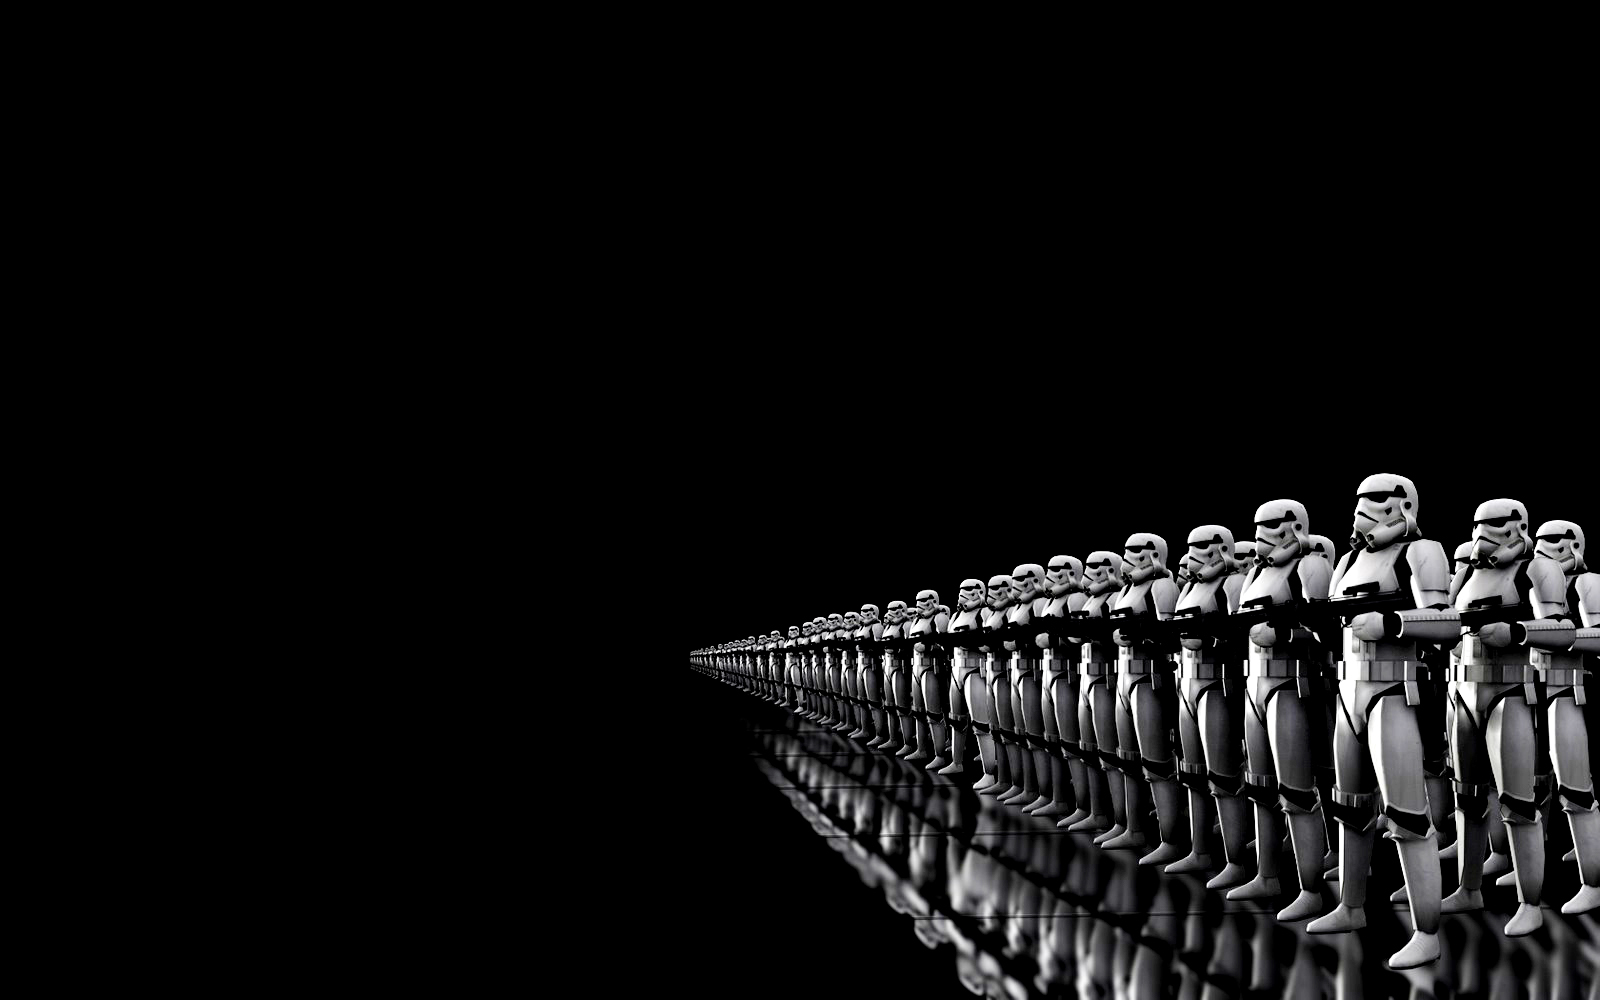 Free Download Star Wars Desktop Wallpaper Download Stormtroopers Star Wars Wallpaper 1600x1000 For Your Desktop Mobile Tablet Explore 48 Free Star Wars Computer Wallpaper Cool Star Wars Wallpaper Star